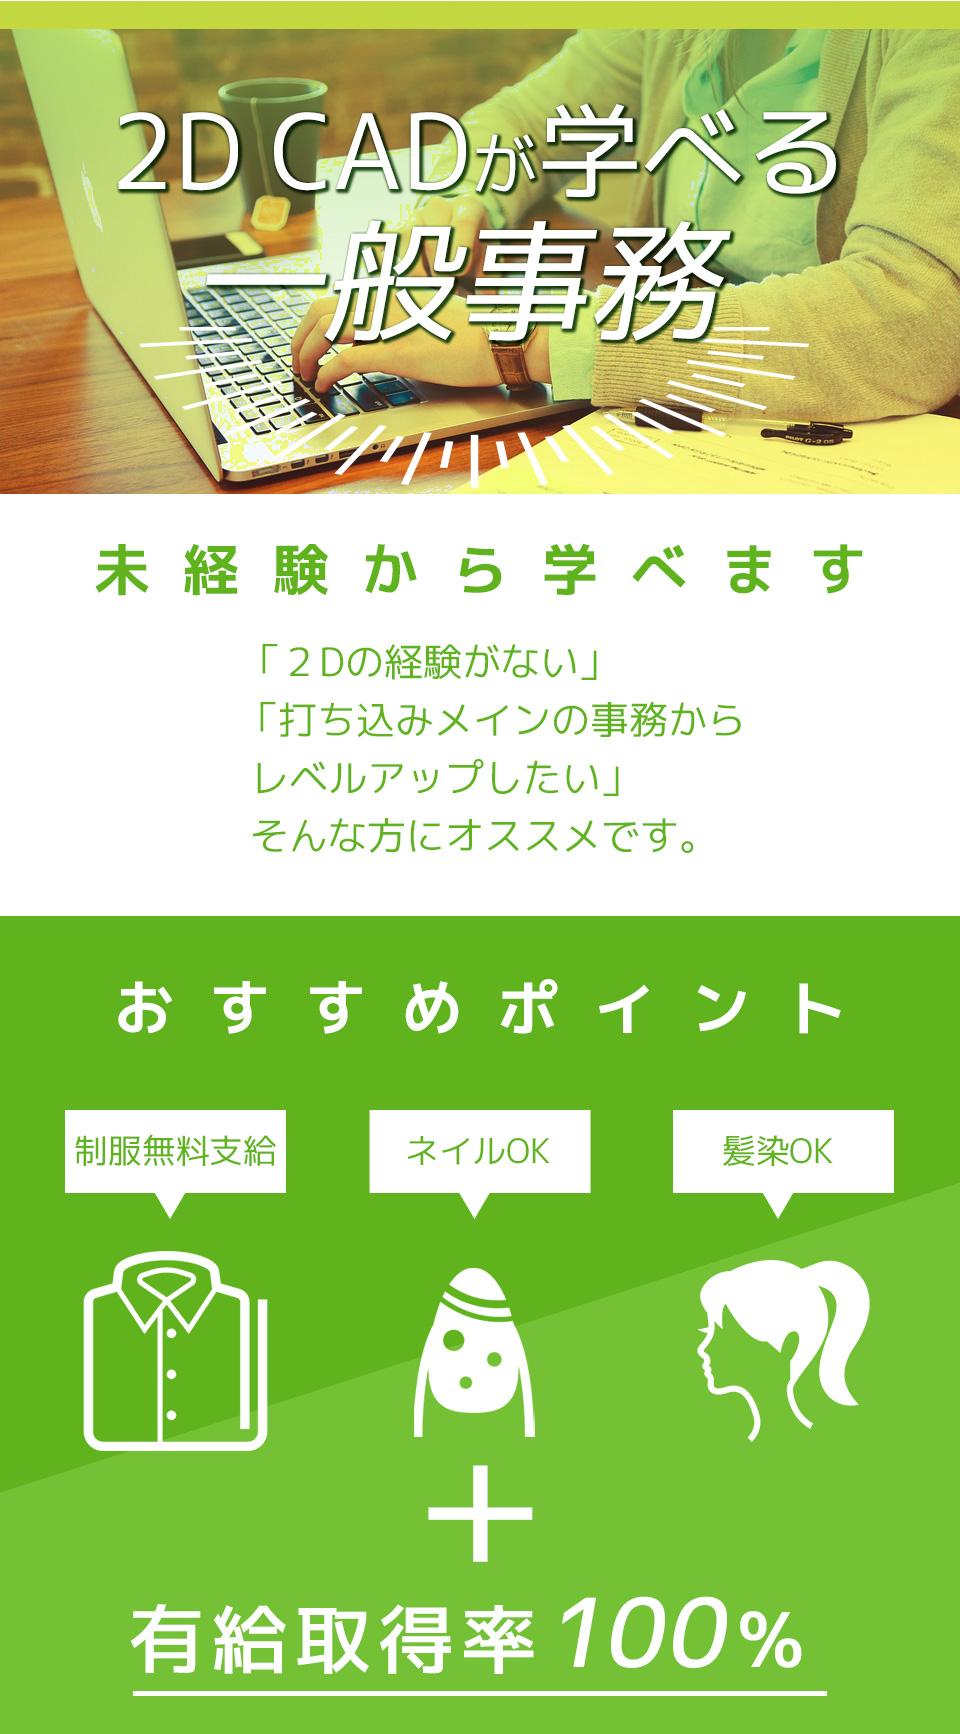 CADが学べる一般事務 愛知県豊川市の派遣社員求人